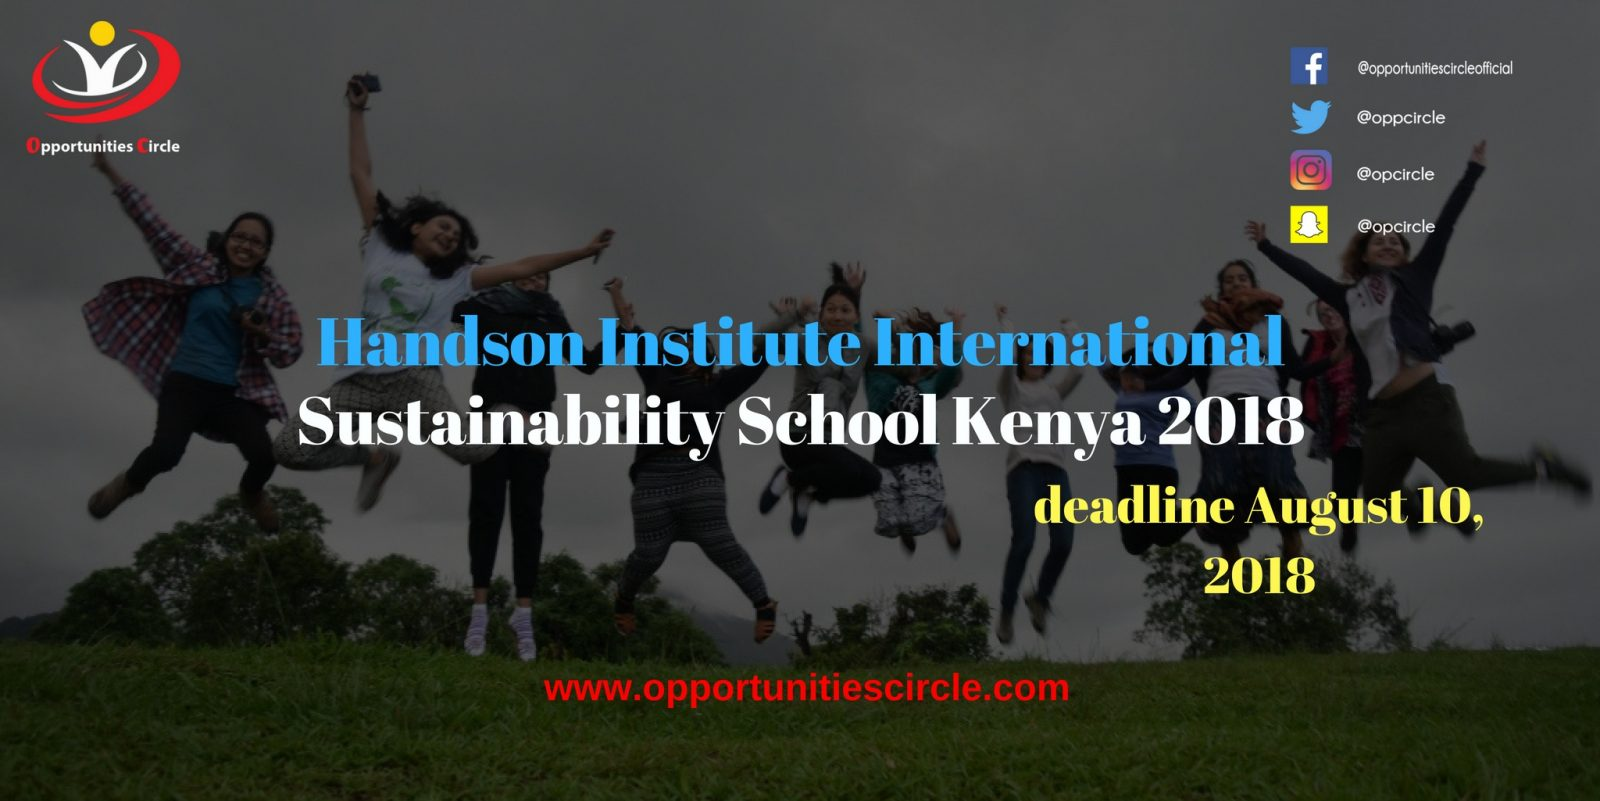 Handson Institute International Sustainability School Kenya 2018 - Handson Institute International Sustainability School Kenya 2018